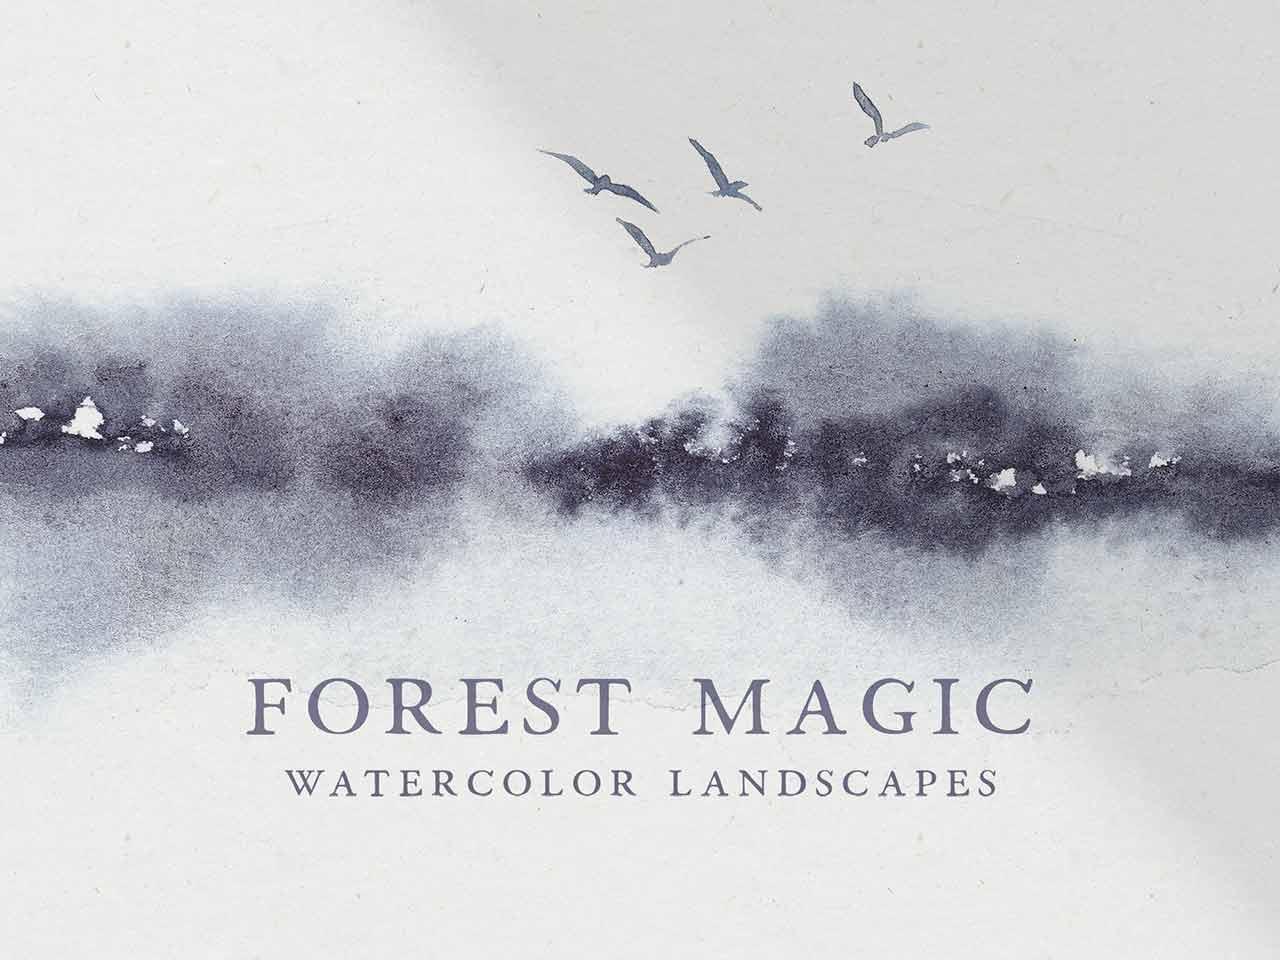 Forest Watercolor Landscapes